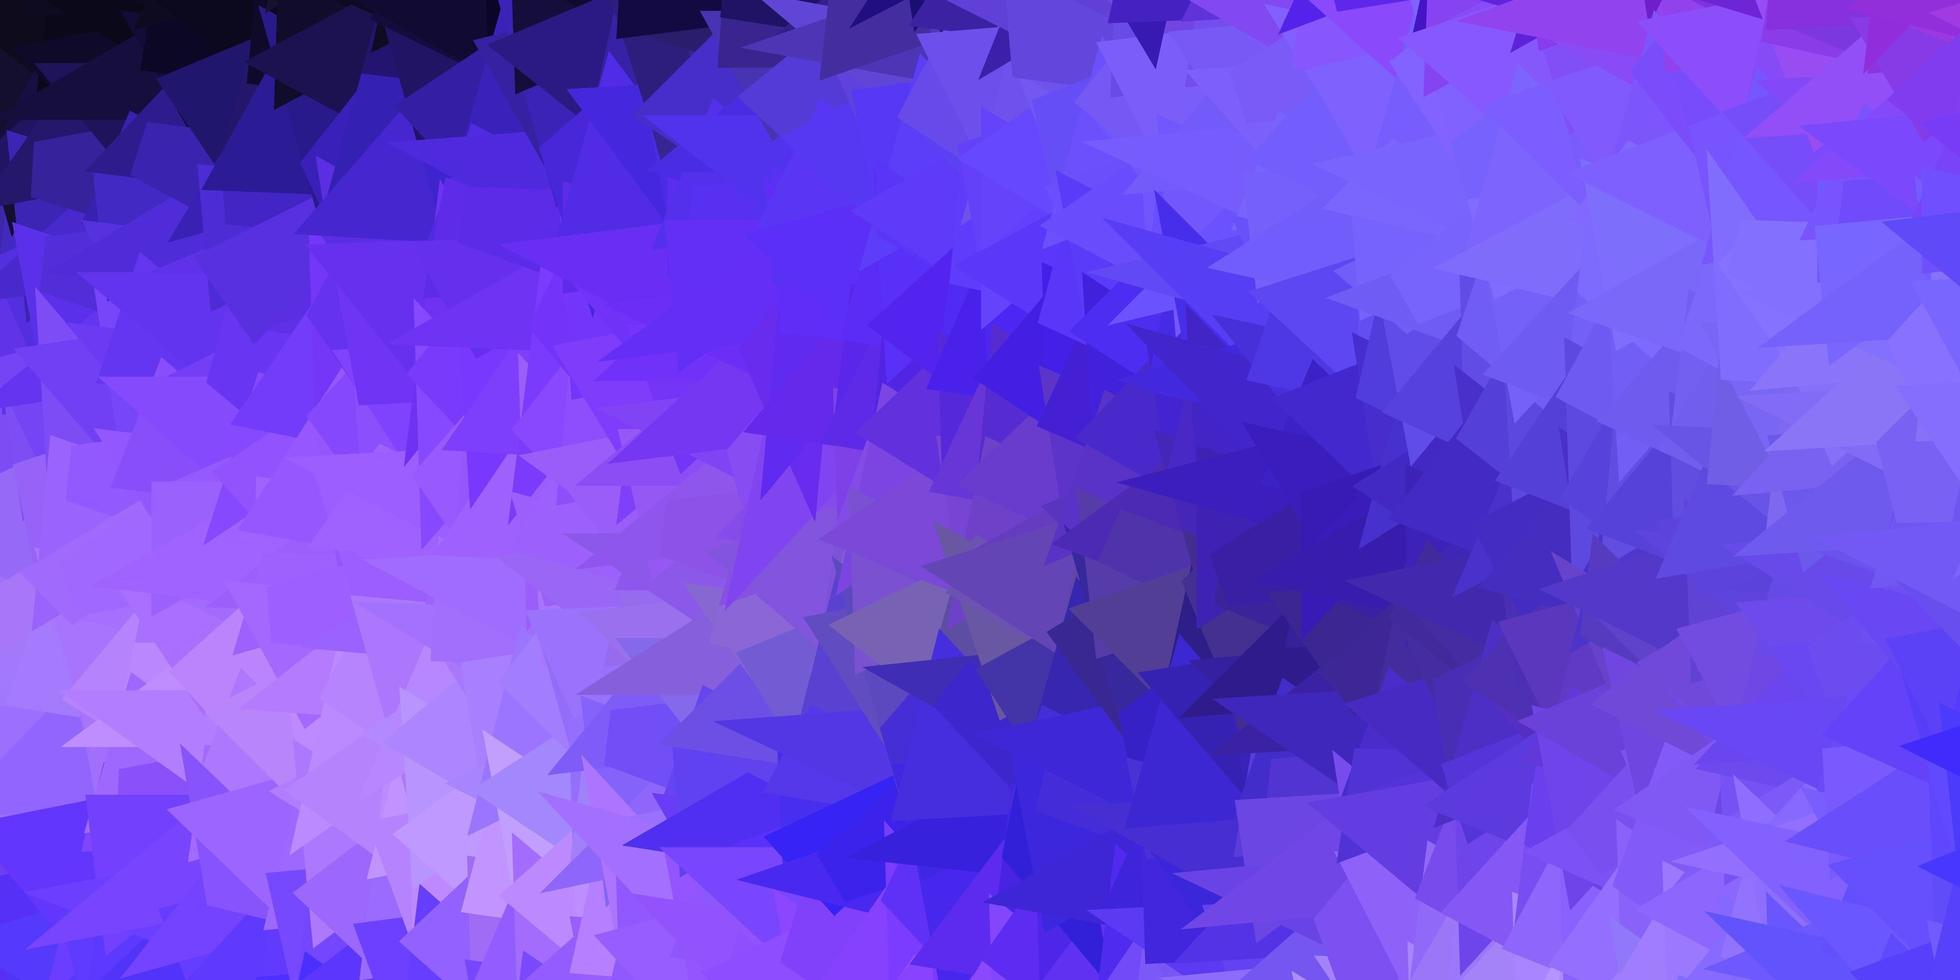 ljus lila vektor triangel mosaik bakgrund.